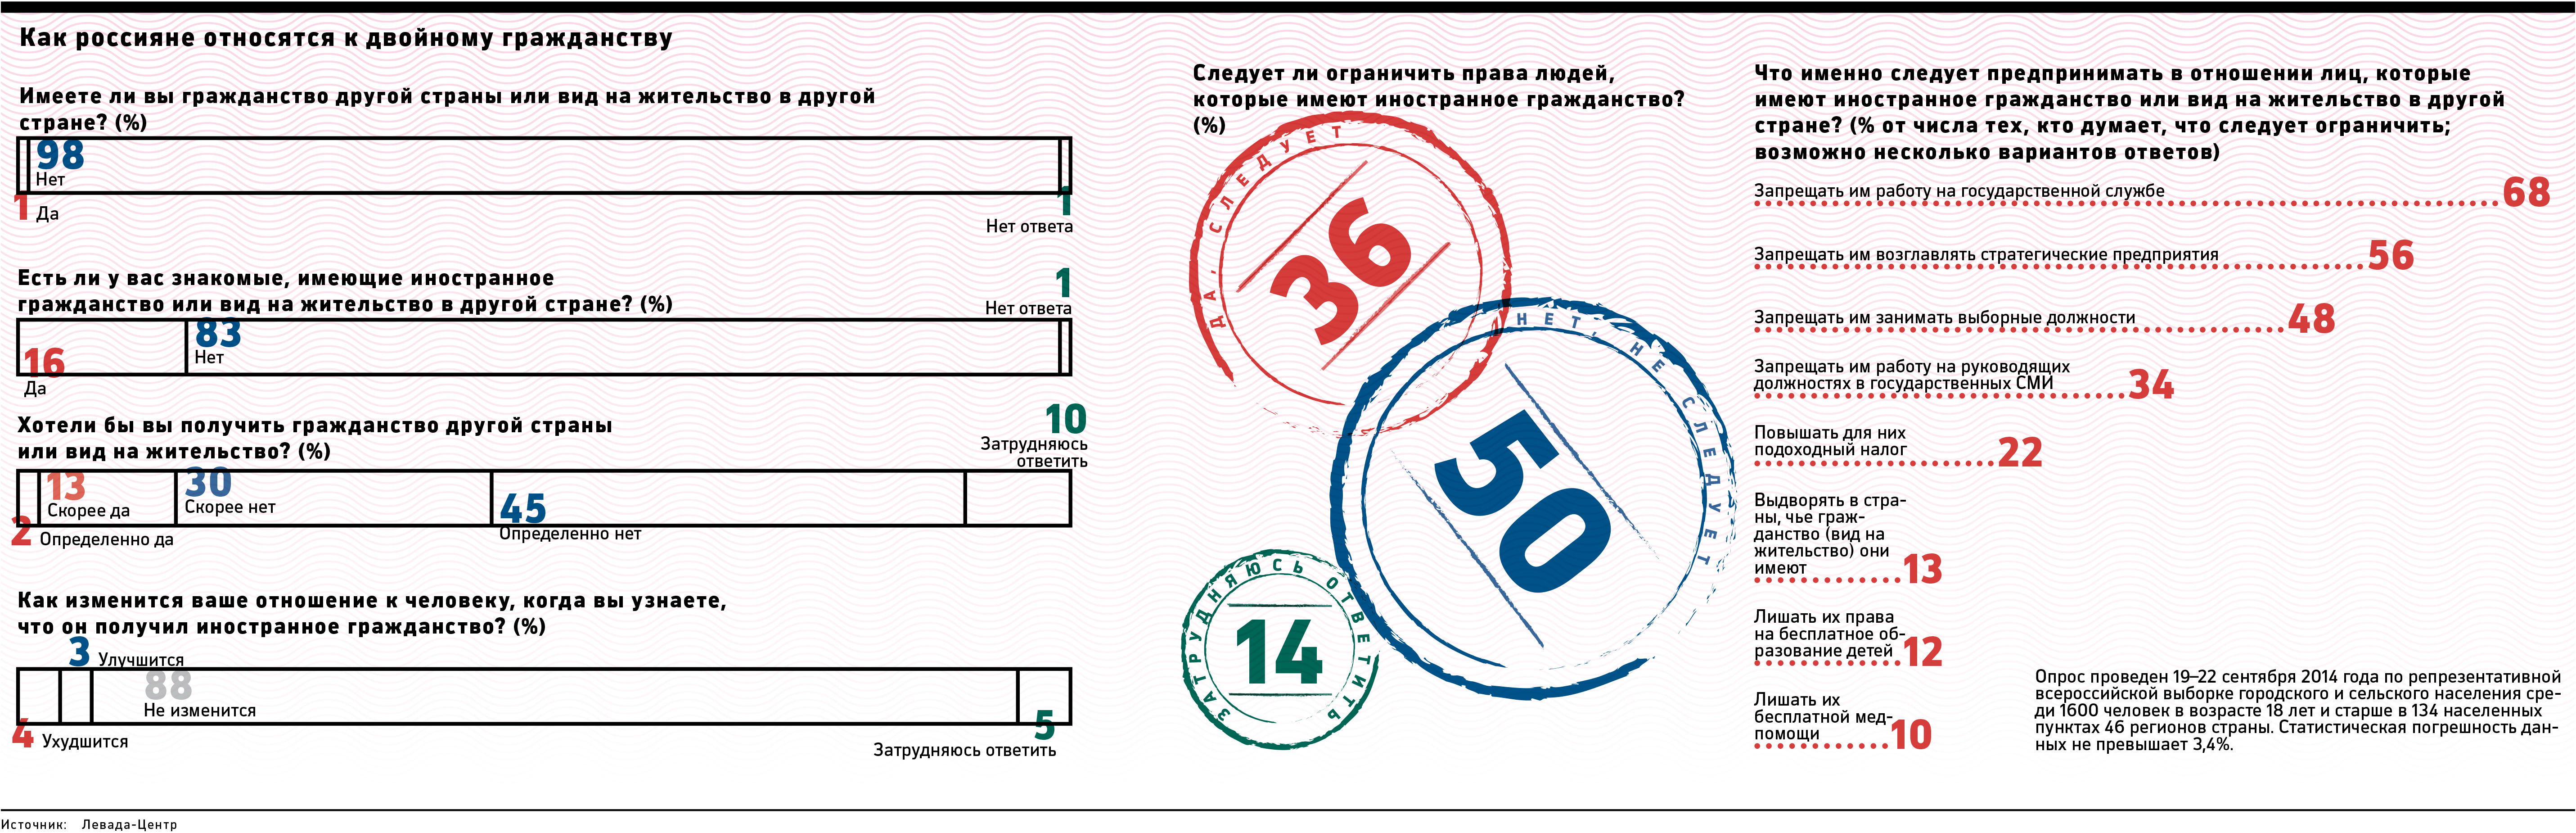 http://pics.v6.top.rbc.ru/v6_top_pics/media/img/7/33/284126251780337.jpg